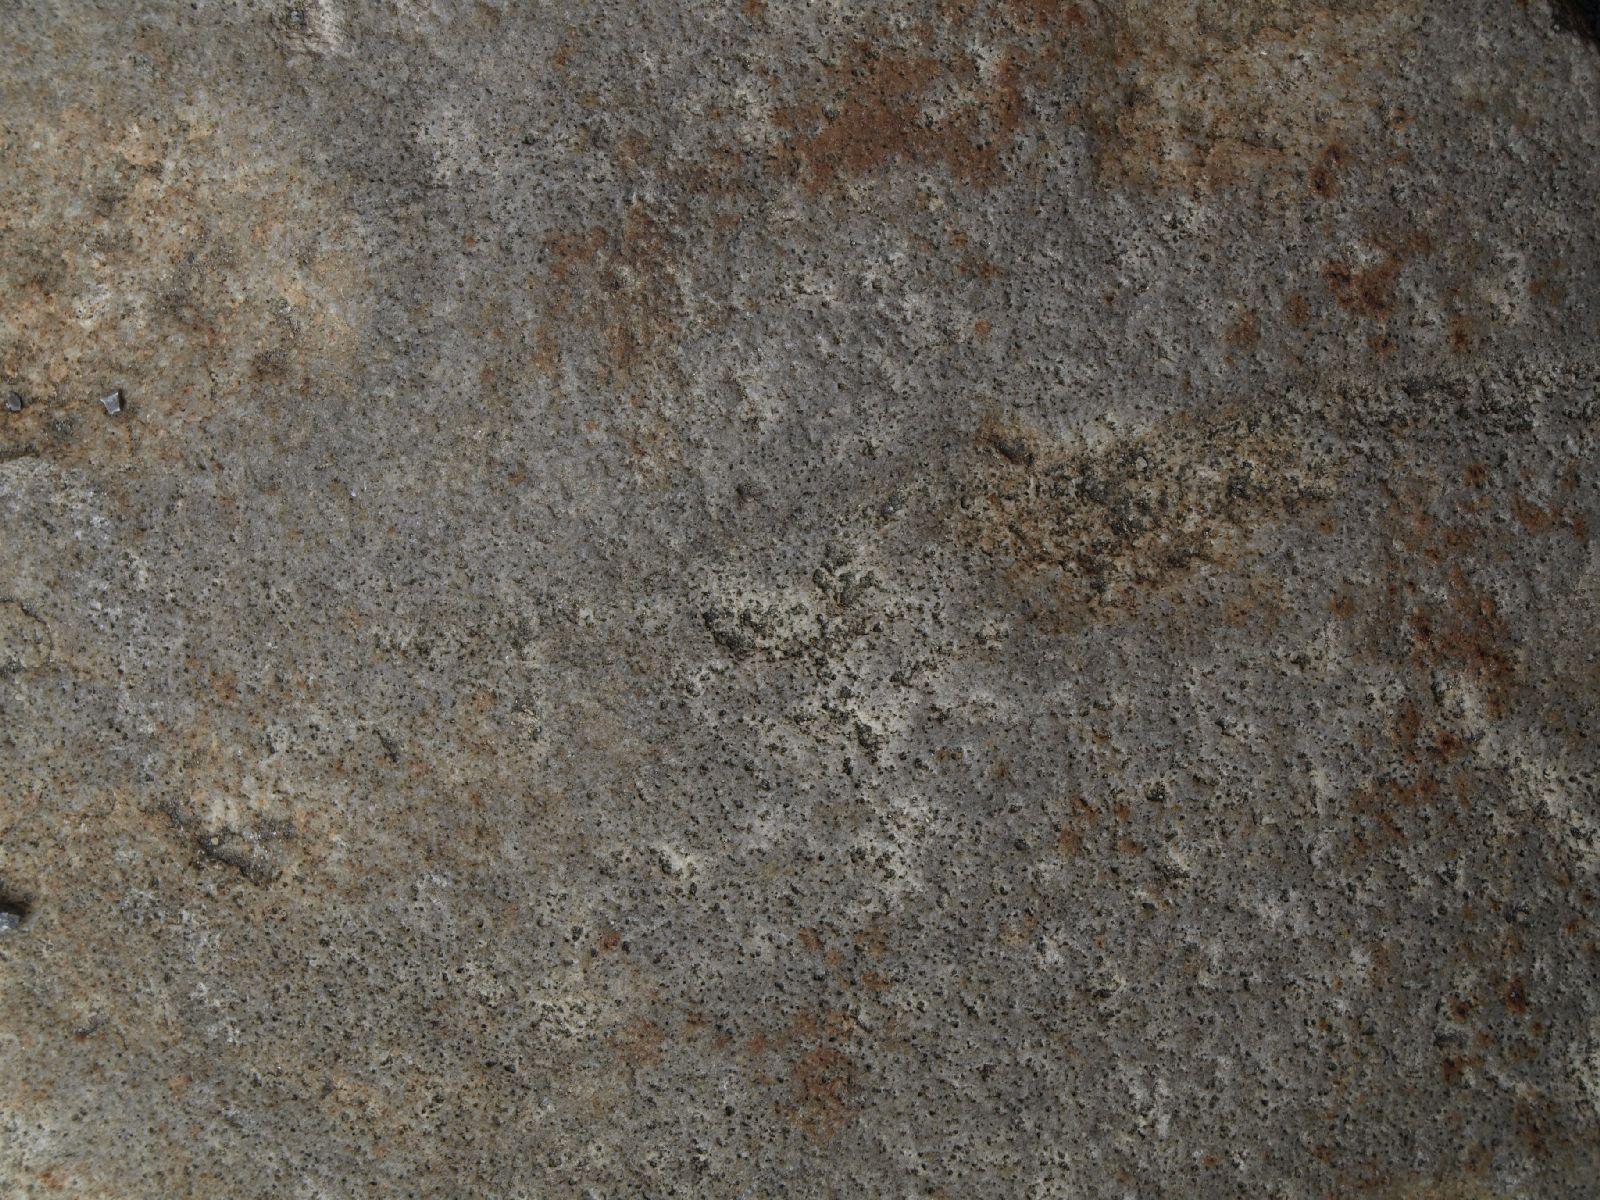 Stein-Felsen_Textur_A_P9205304